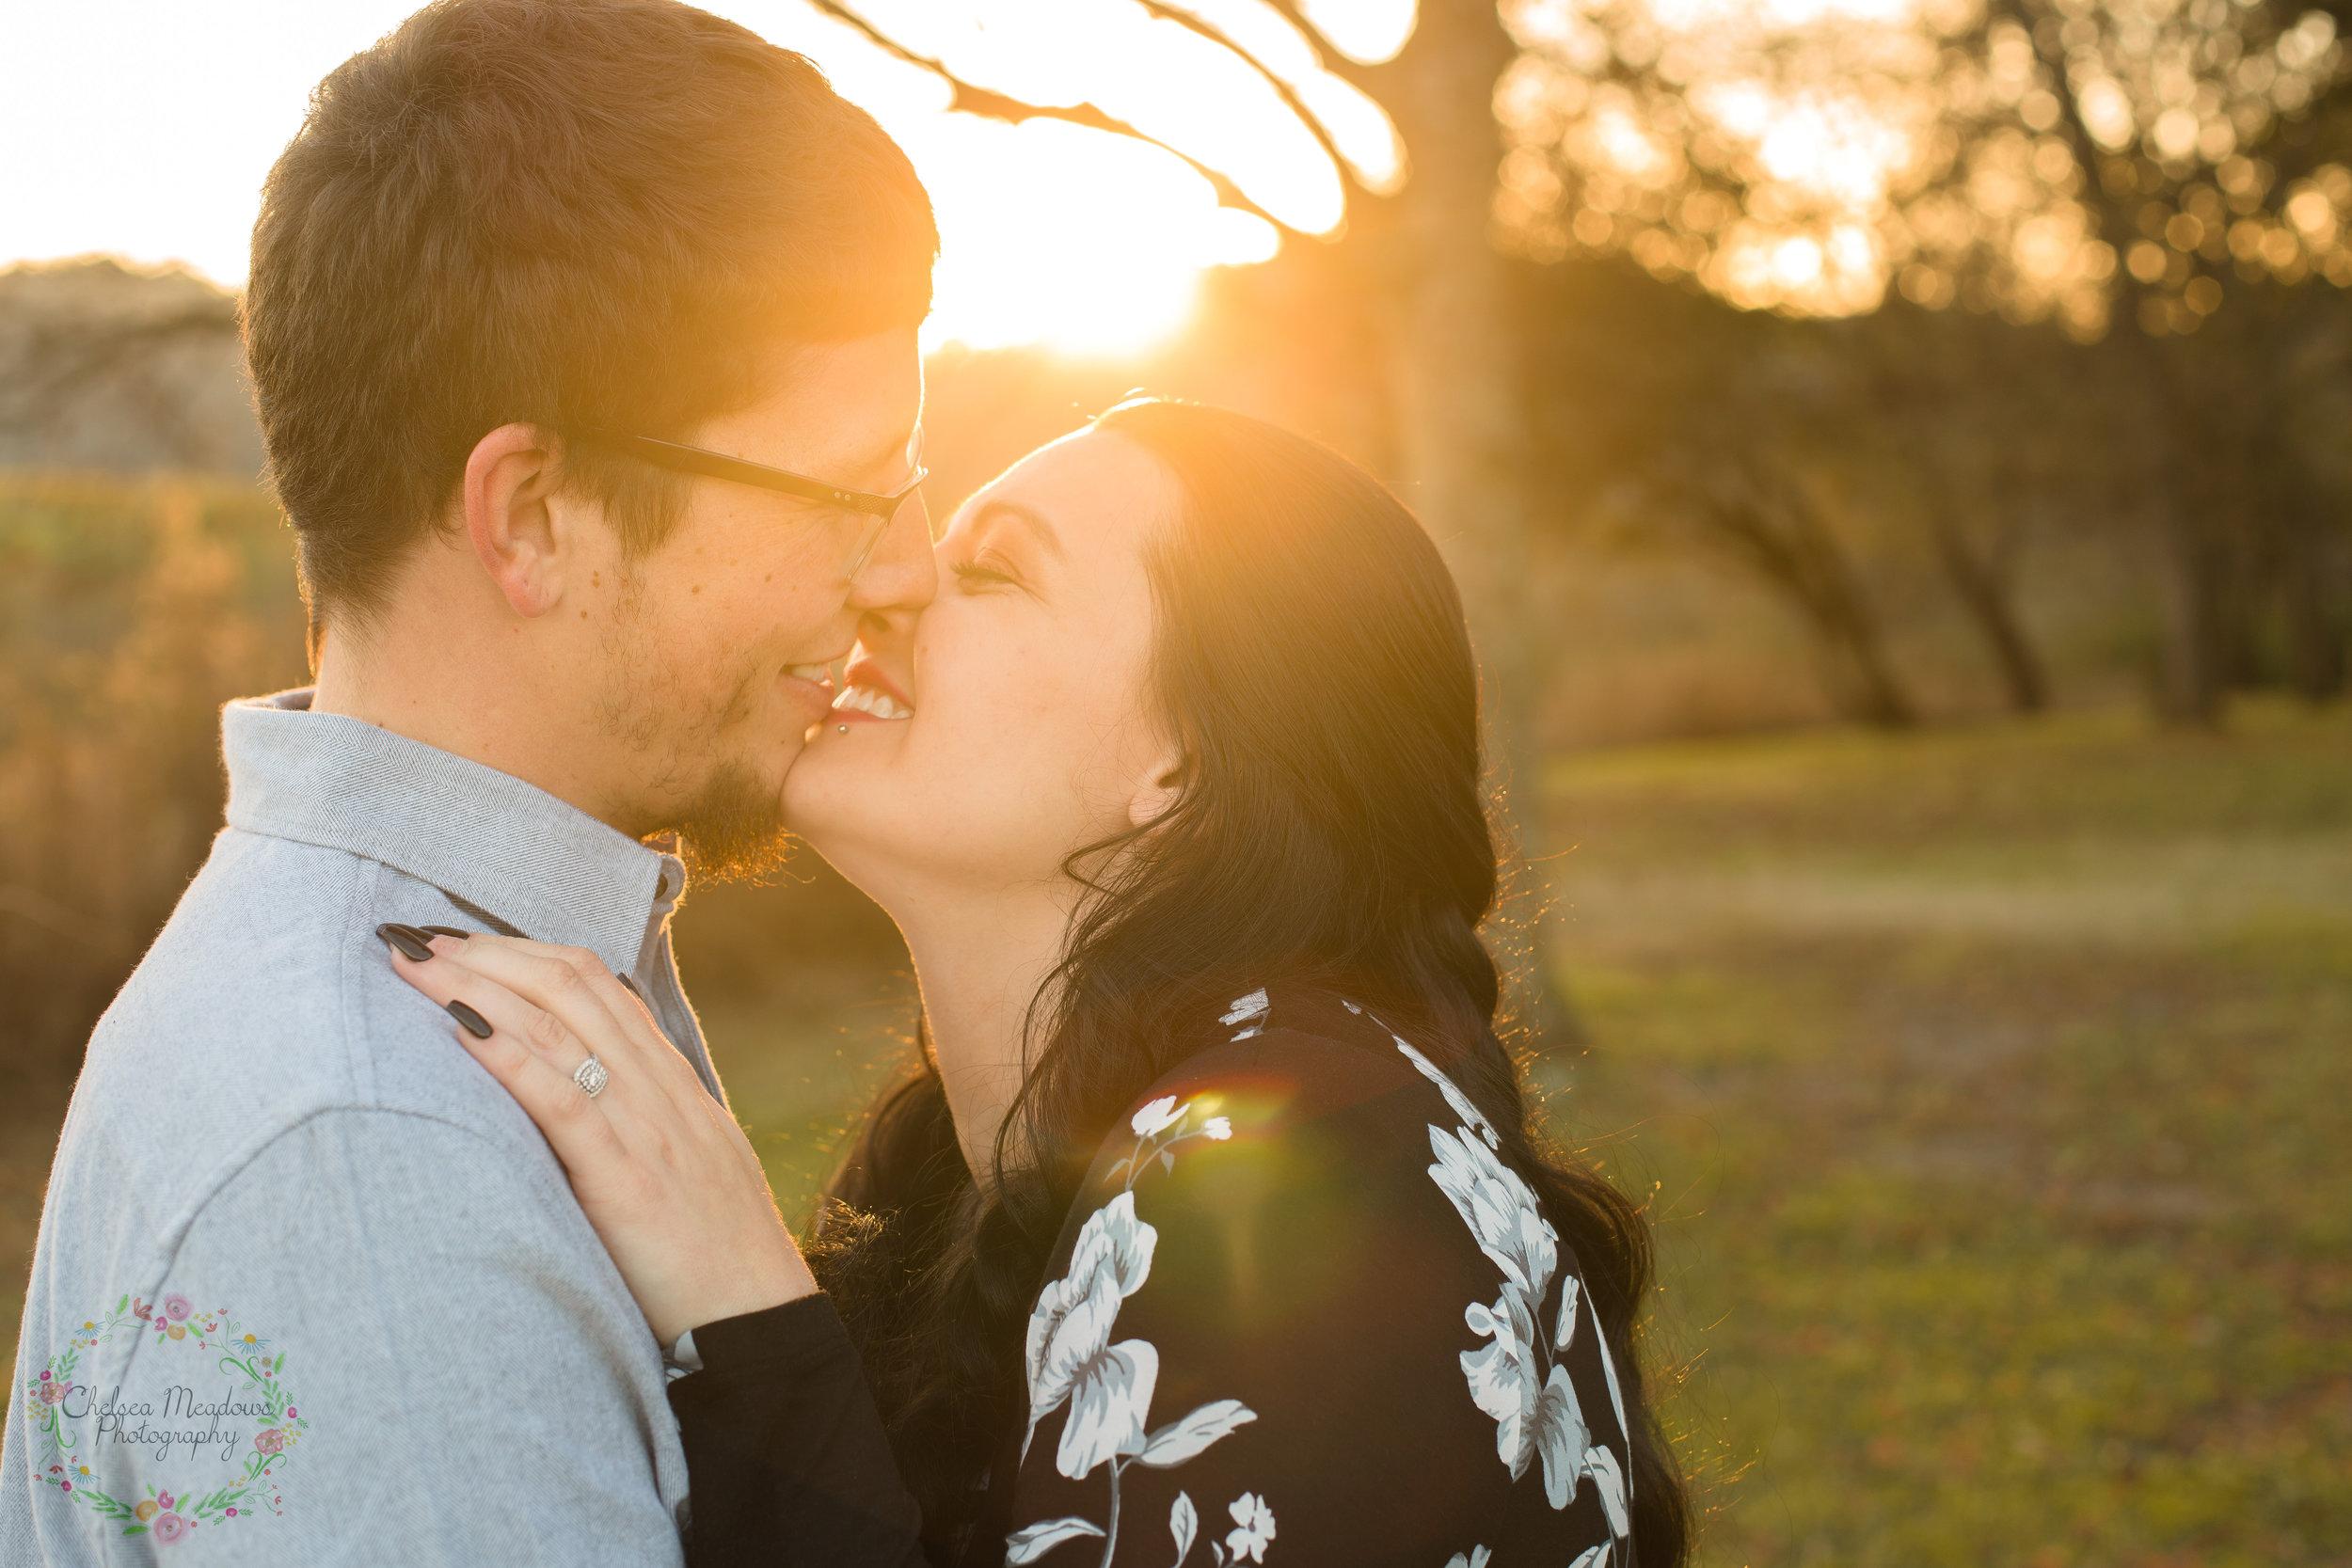 Jessica & Derek Engagement - Nashville Wedding Photographer - Chelsea Meadows Photography (11).jpg